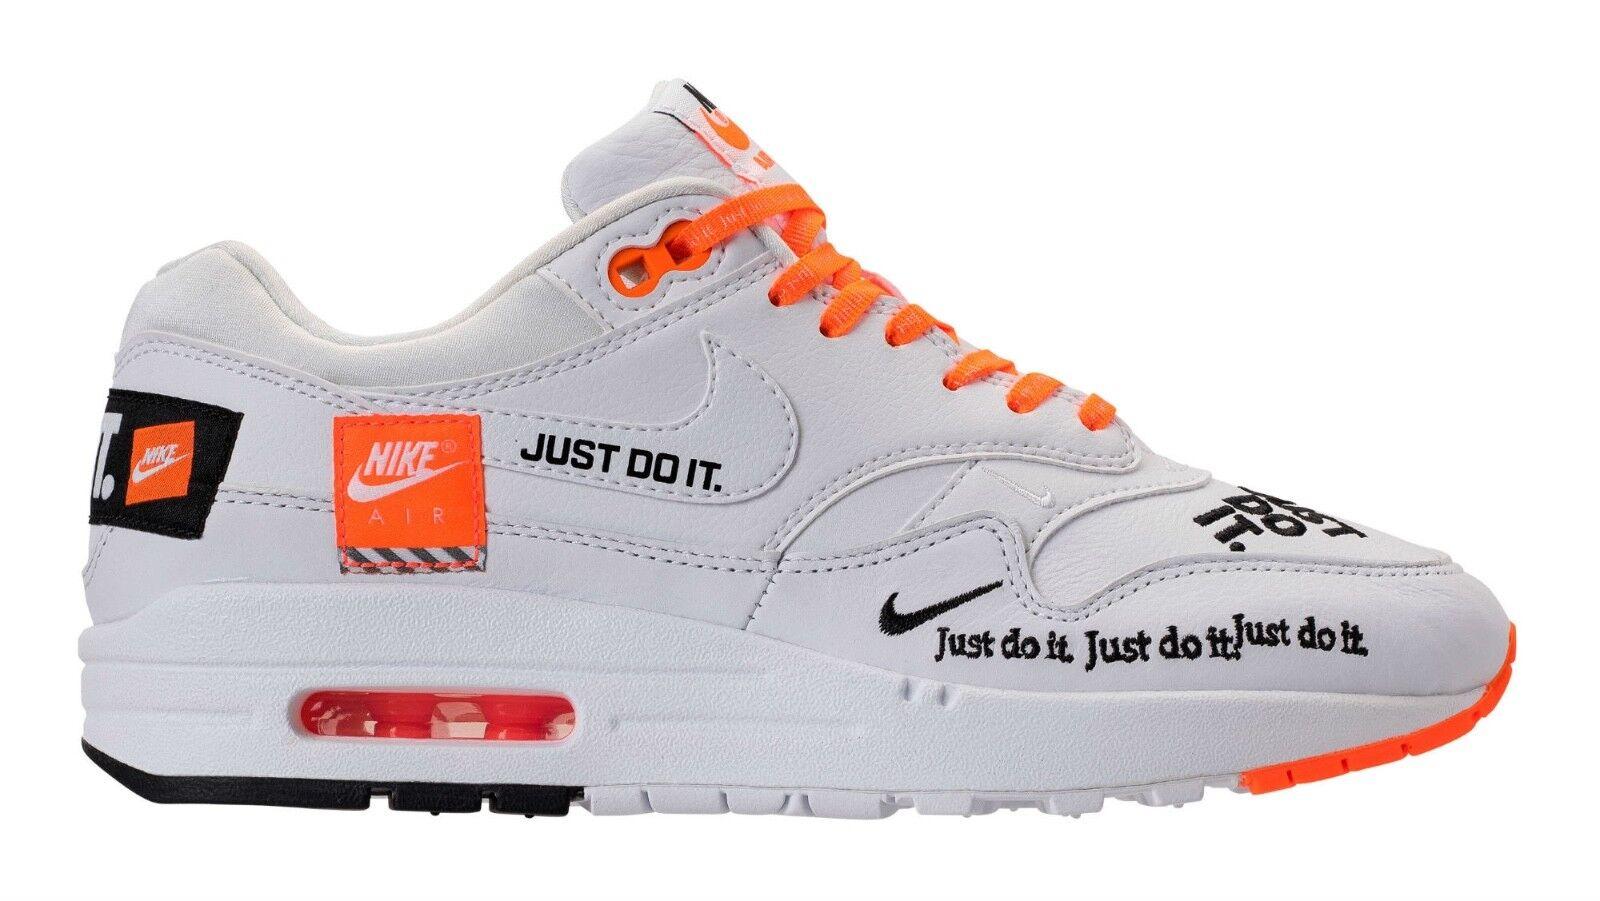 Nike Air Max 1 SE Lux Just Do It White Orange A01021 100 men size 8-13